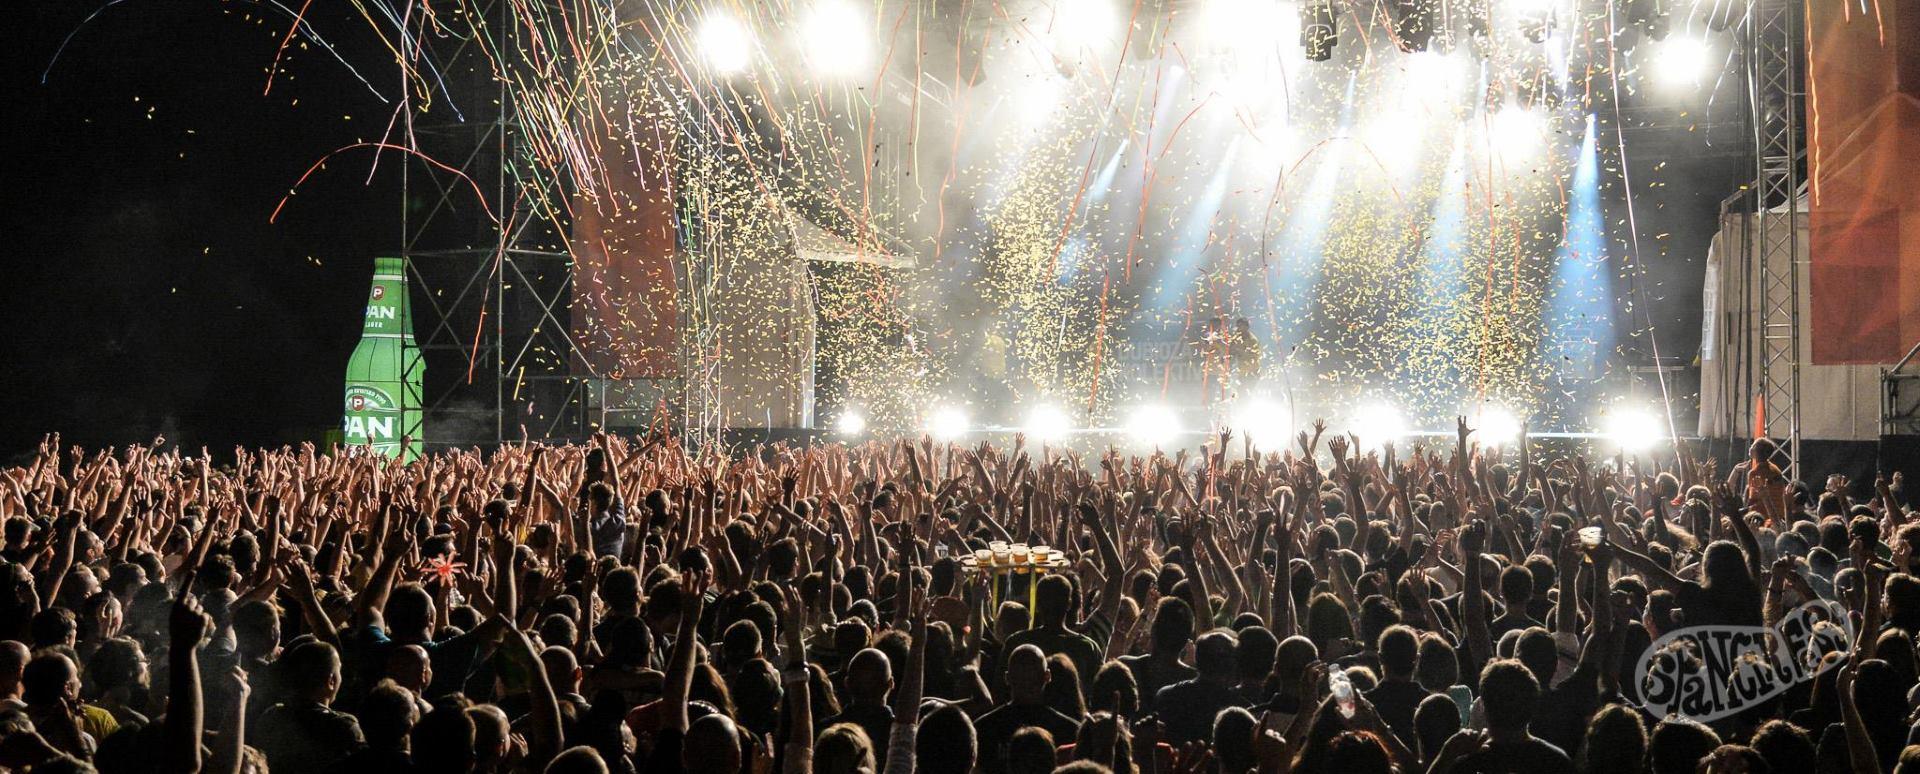 Špancirfest uvršten među dvadeset najboljih europskih festivala